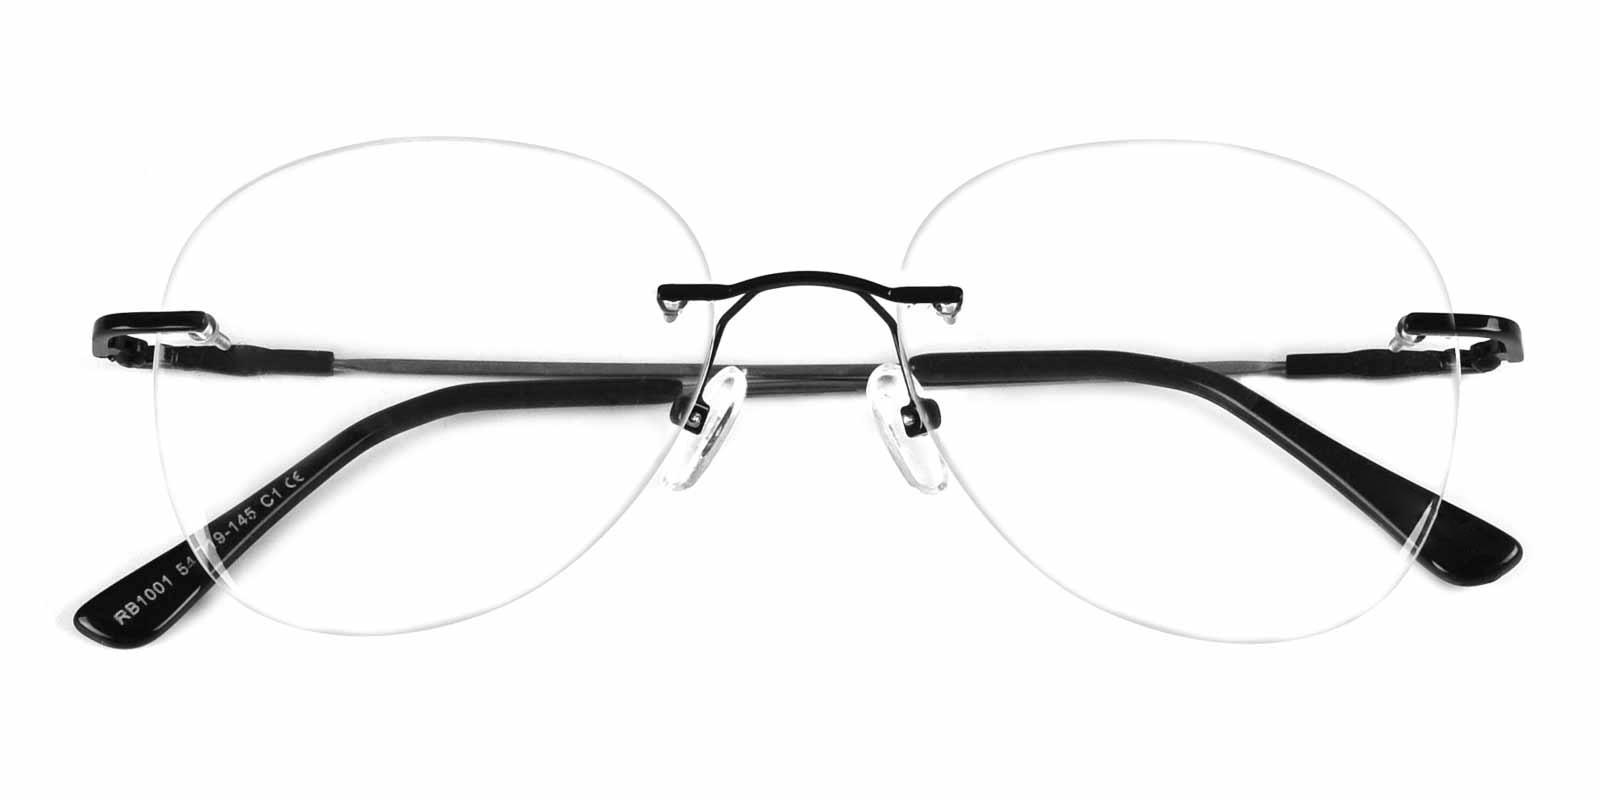 Abbet-Black-Aviator-Metal-Eyeglasses-detail